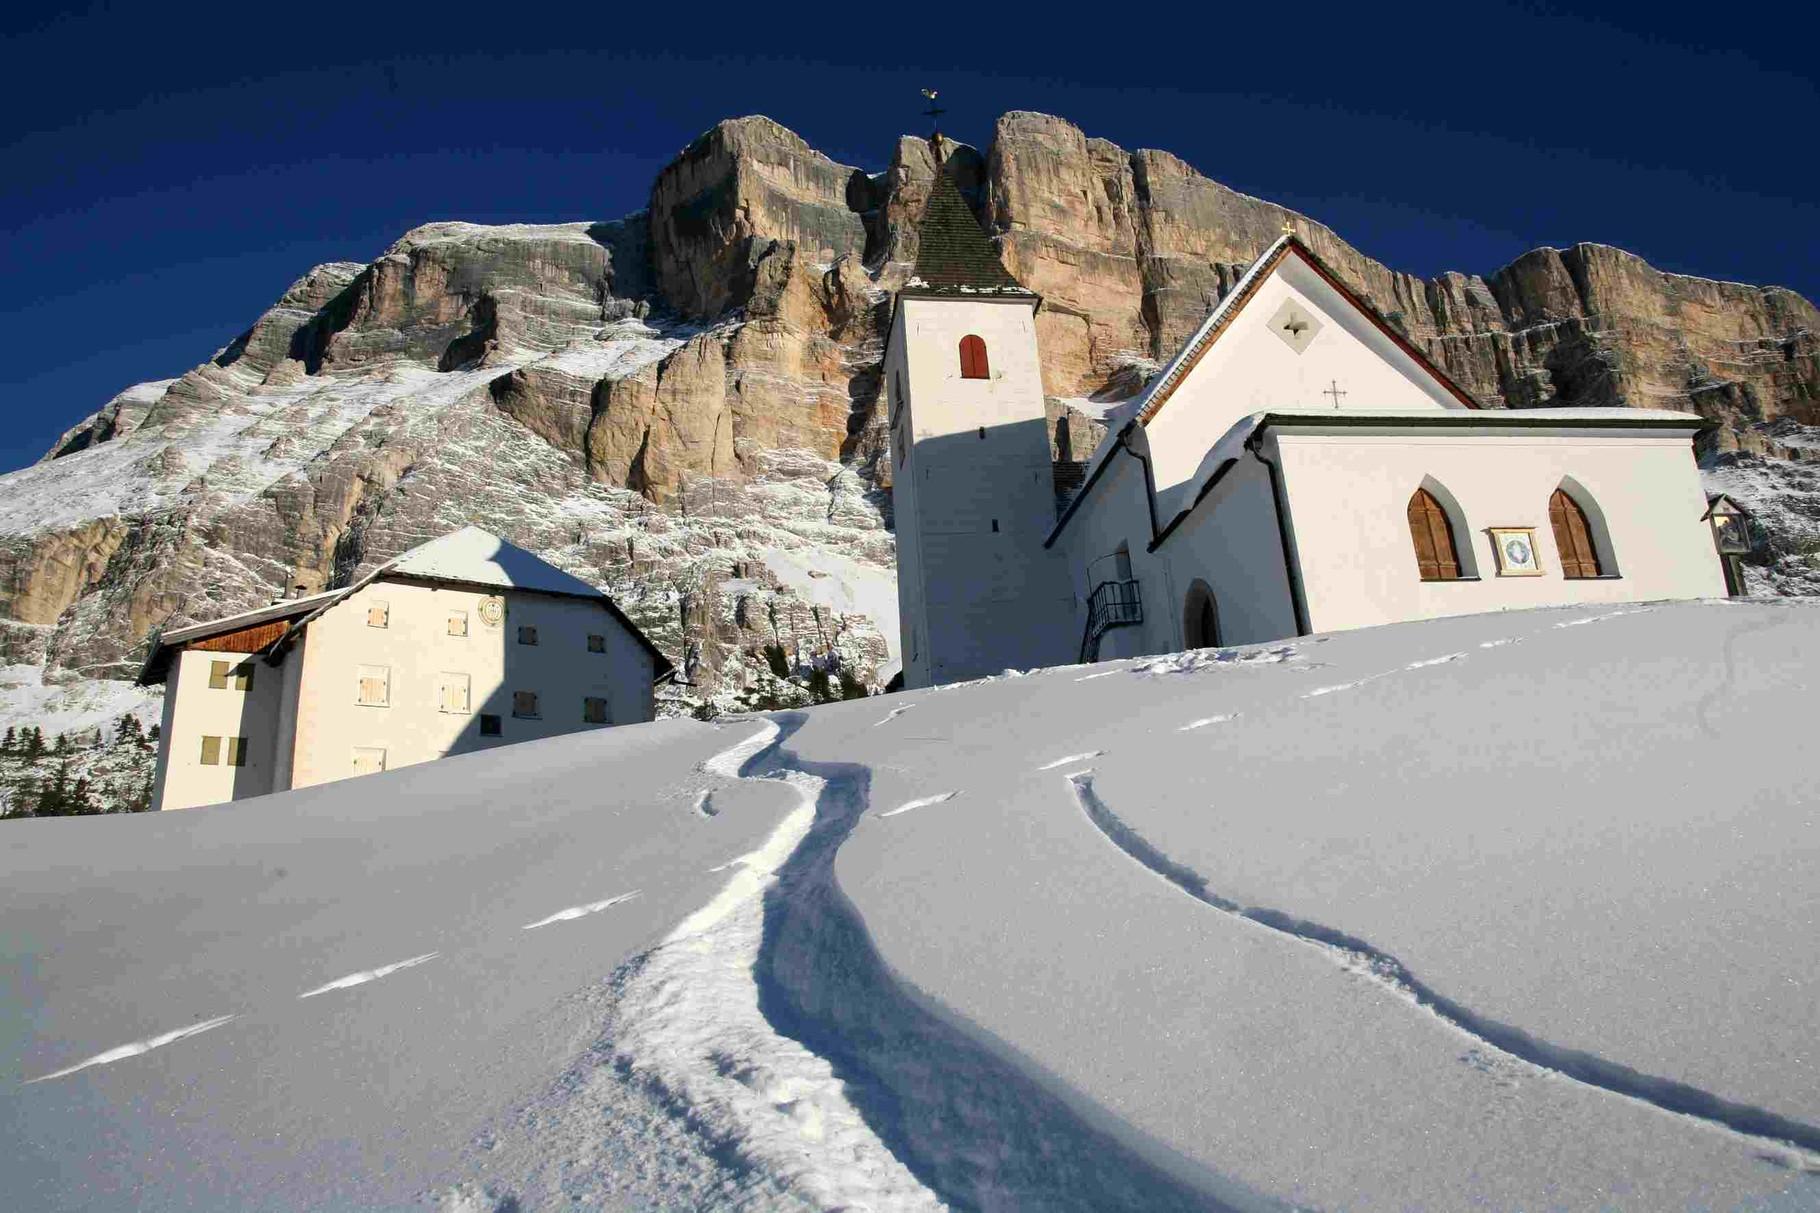 Alta Badia - Chiesetta S. Croce